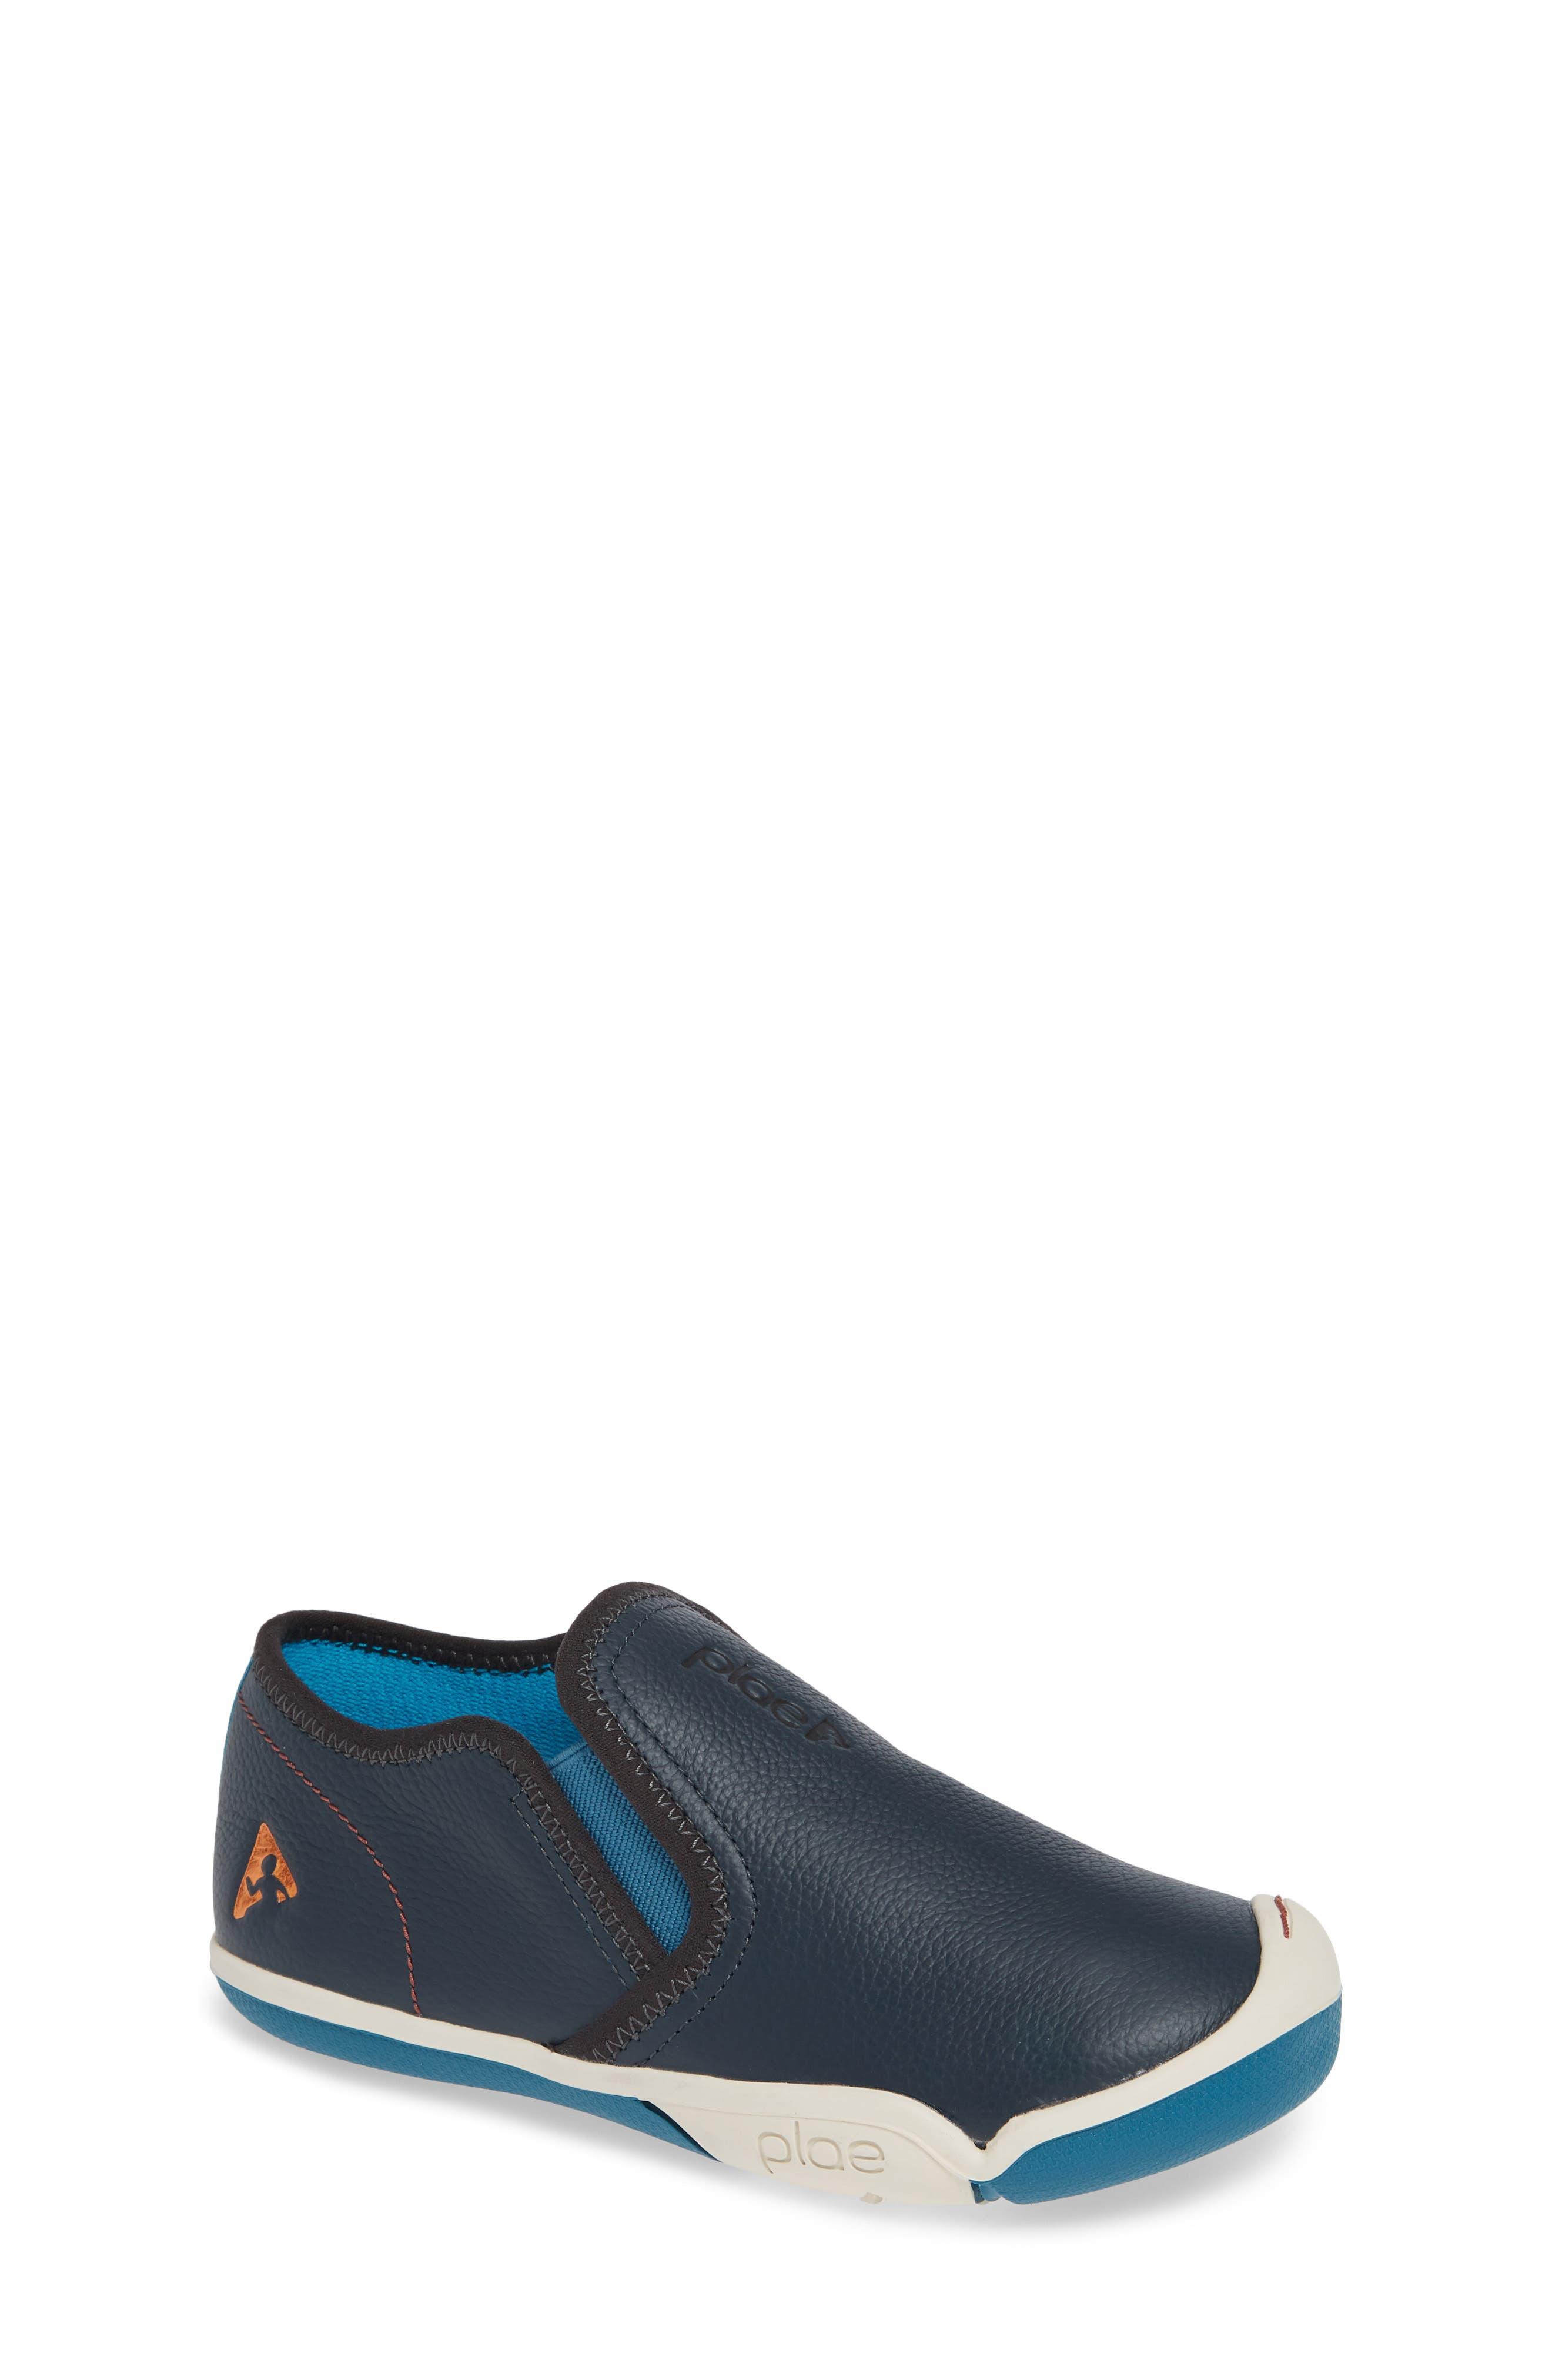 Migi Slip-On Sneaker,                             Main thumbnail 1, color,                             Octo Ink